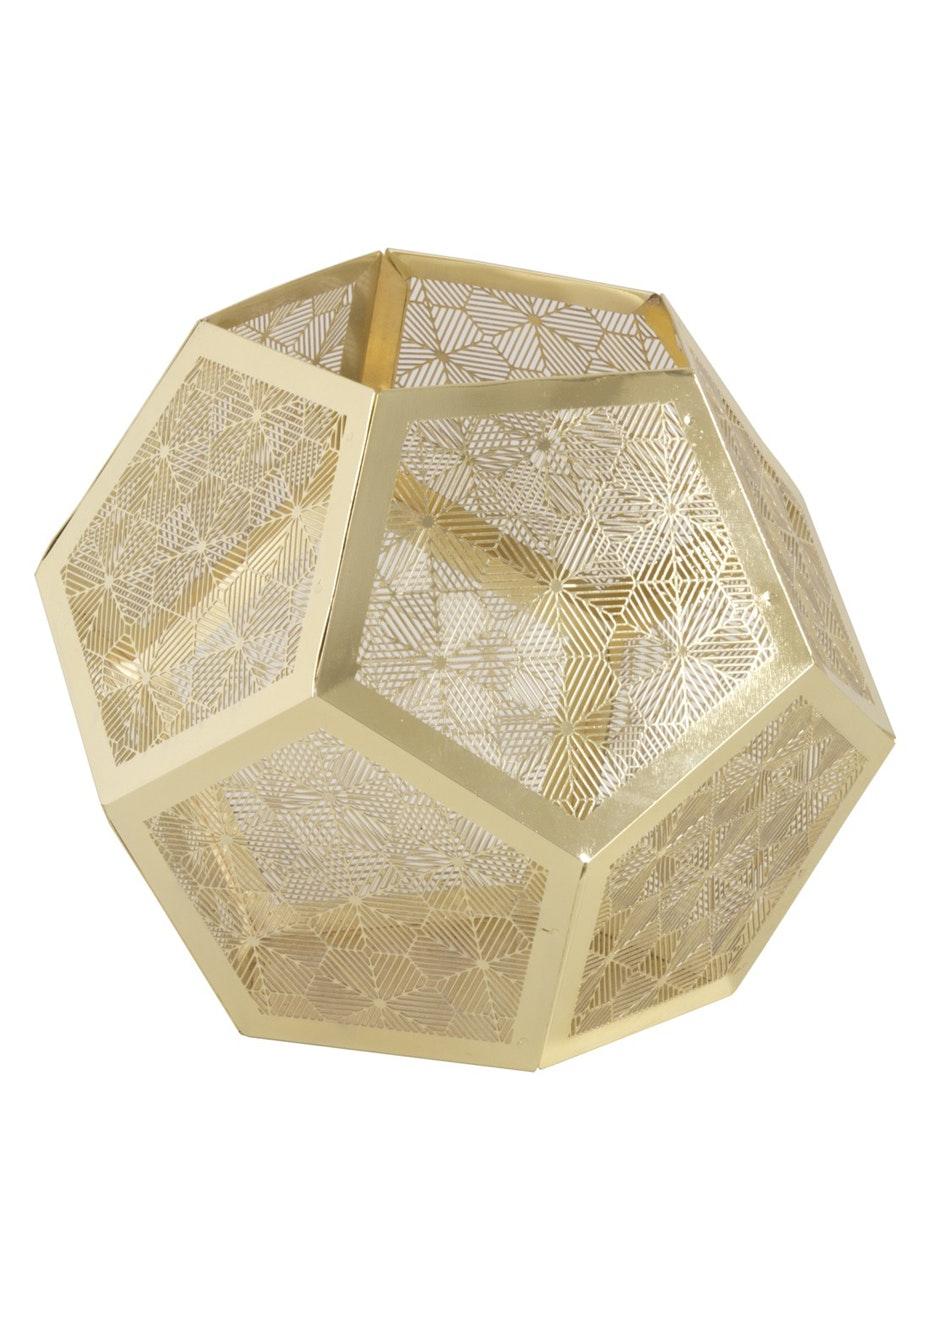 Jason - Geometric candle holder - Gold patterned